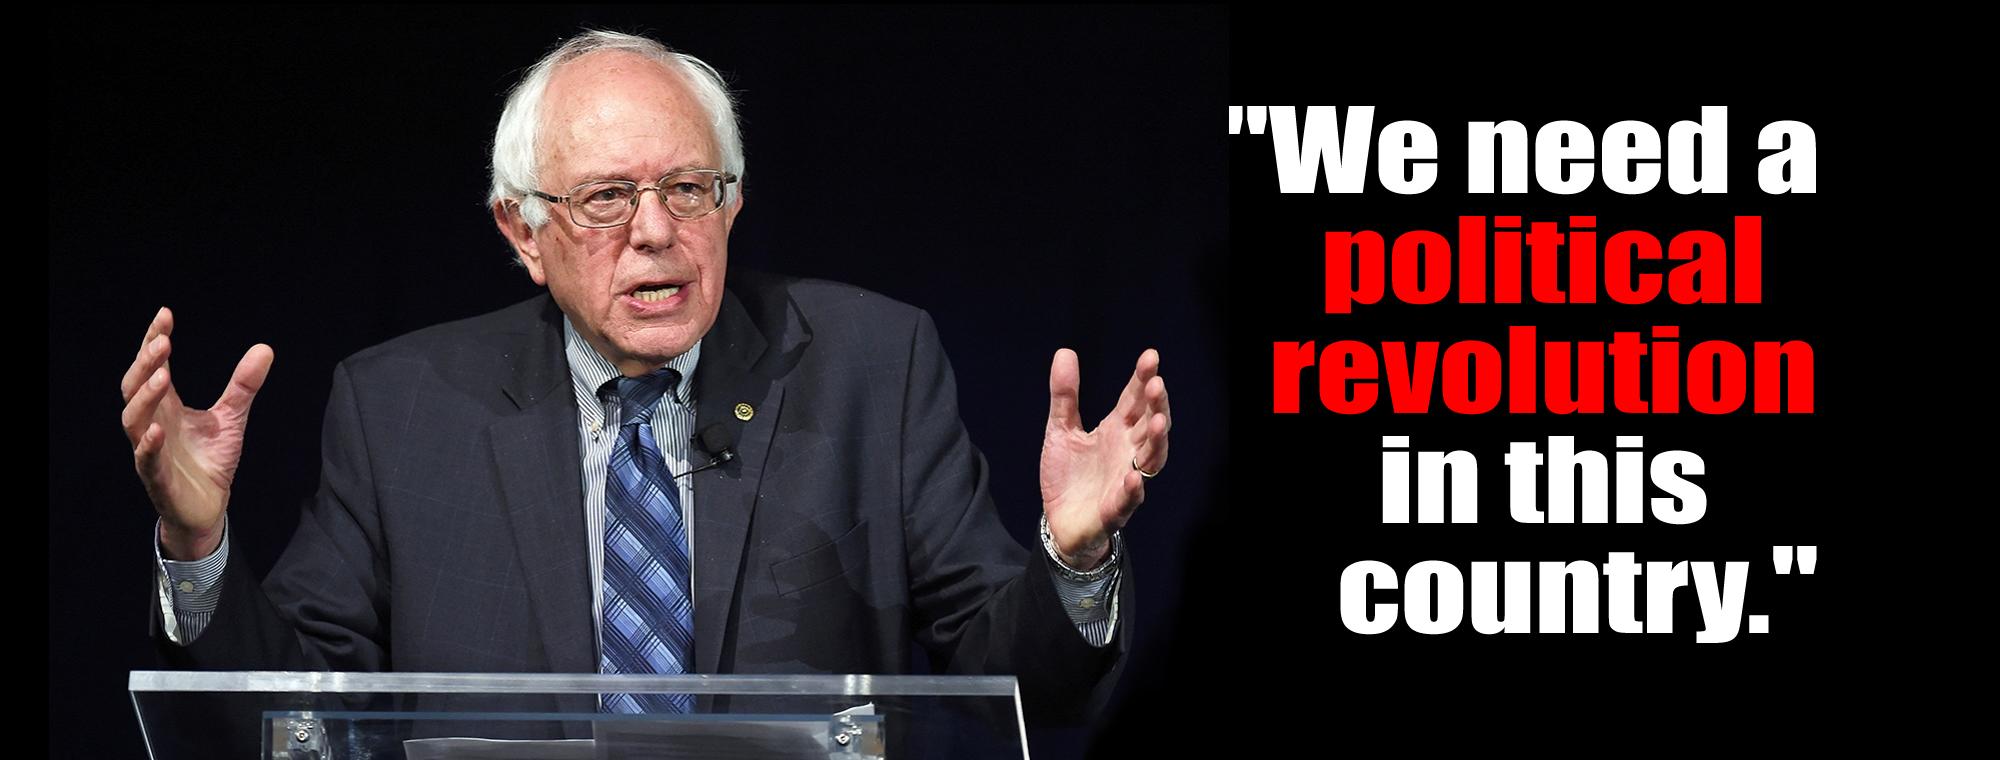 Bernie-Sanders_Revolution_1